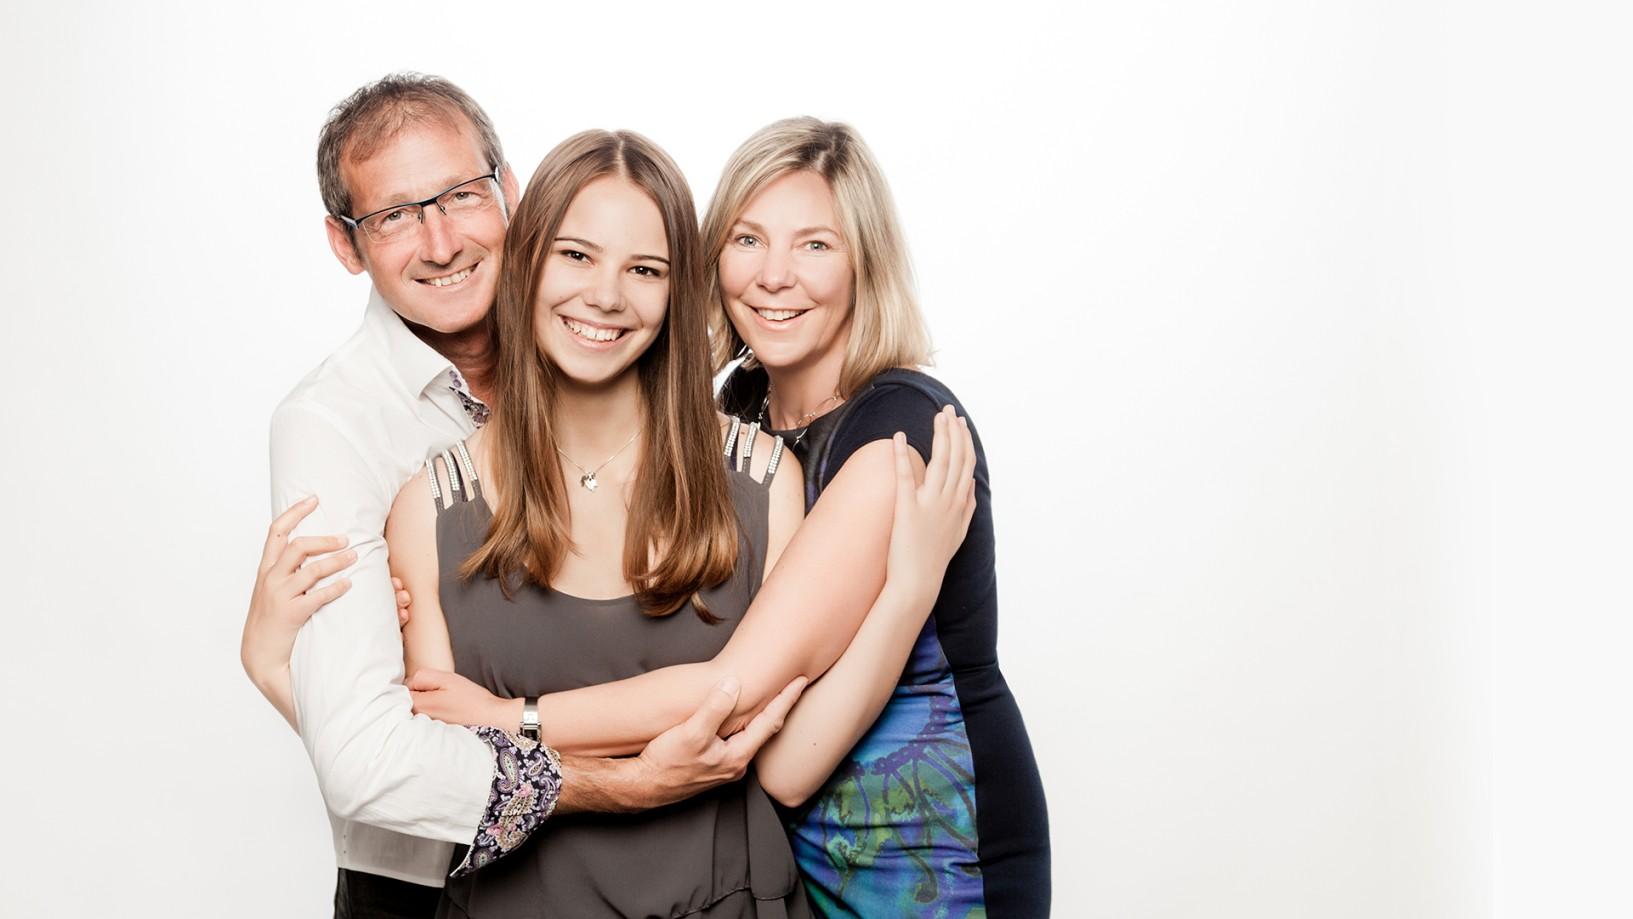 Fotostudio Floyd - Familie